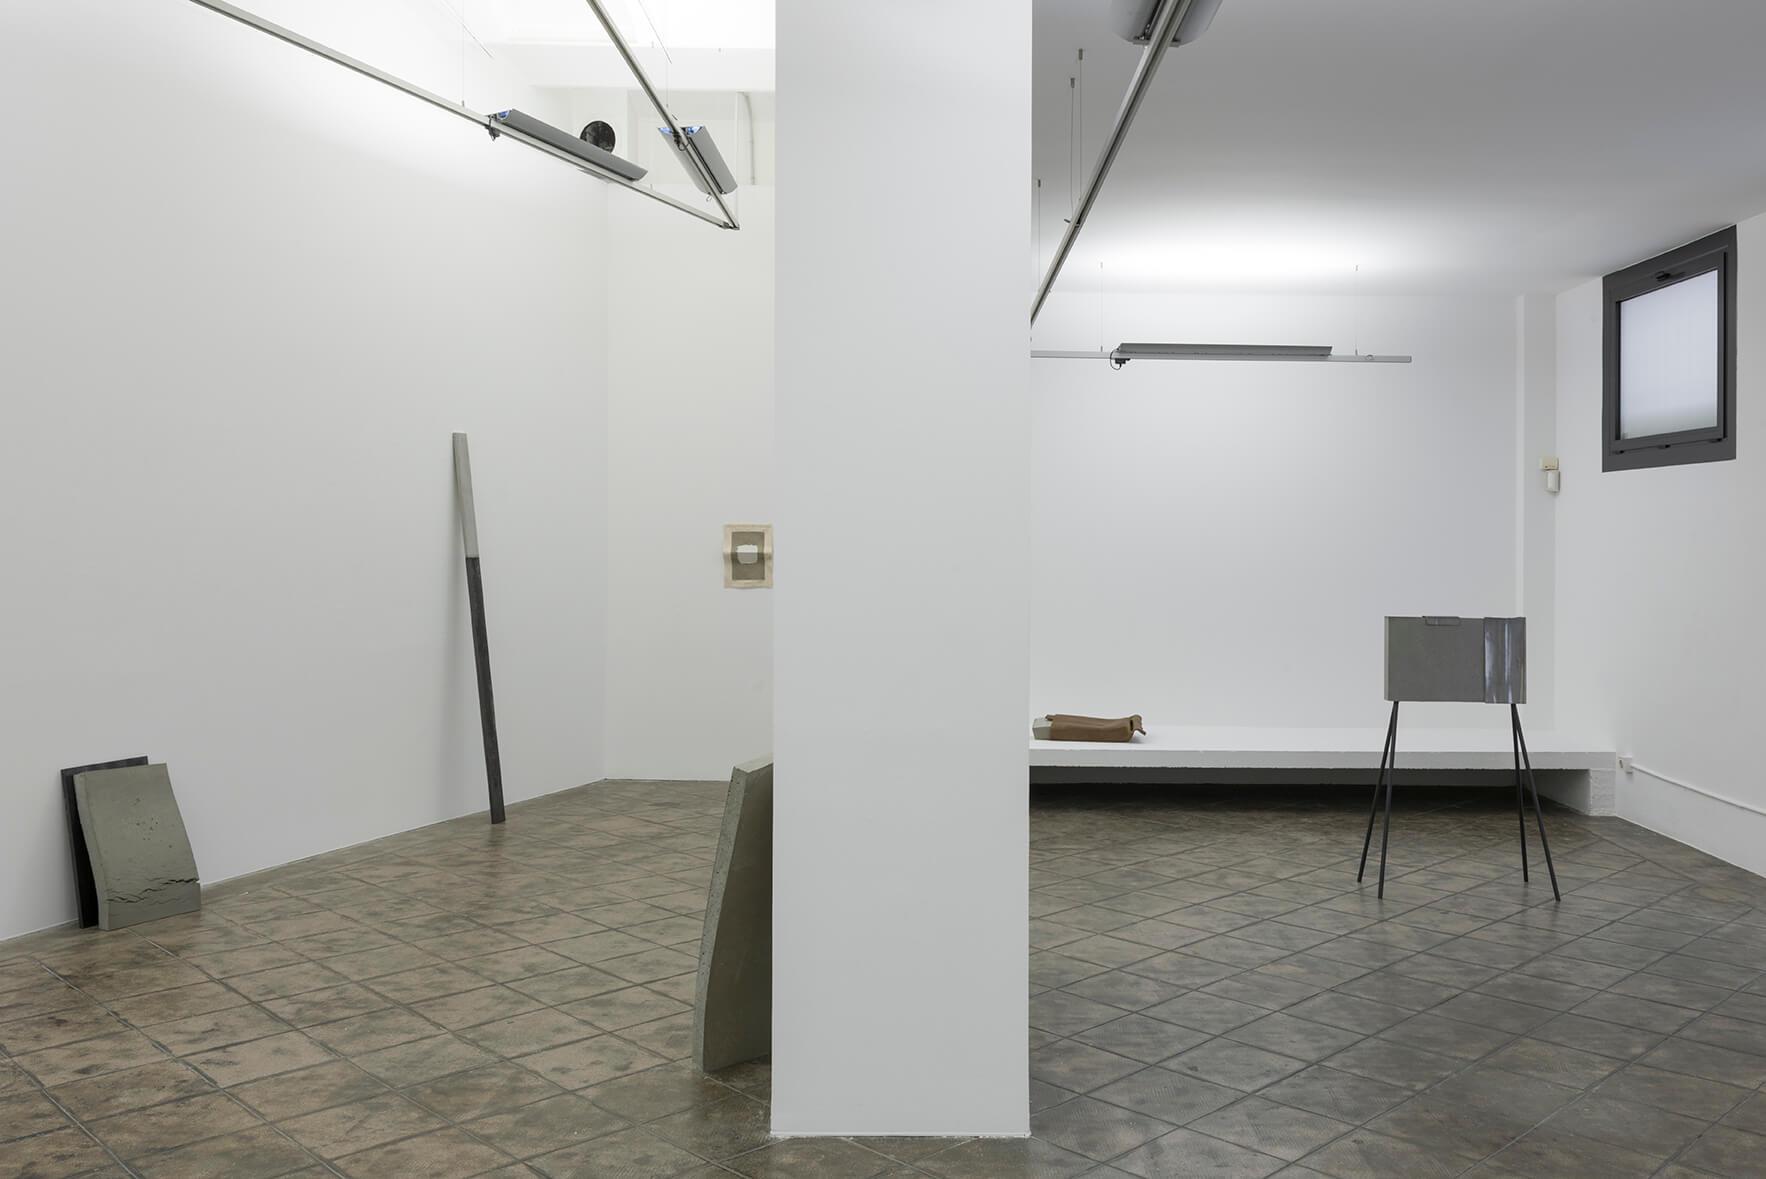 Installation view: On Fold, ProjecteSD | On Fold | ProjecteSD